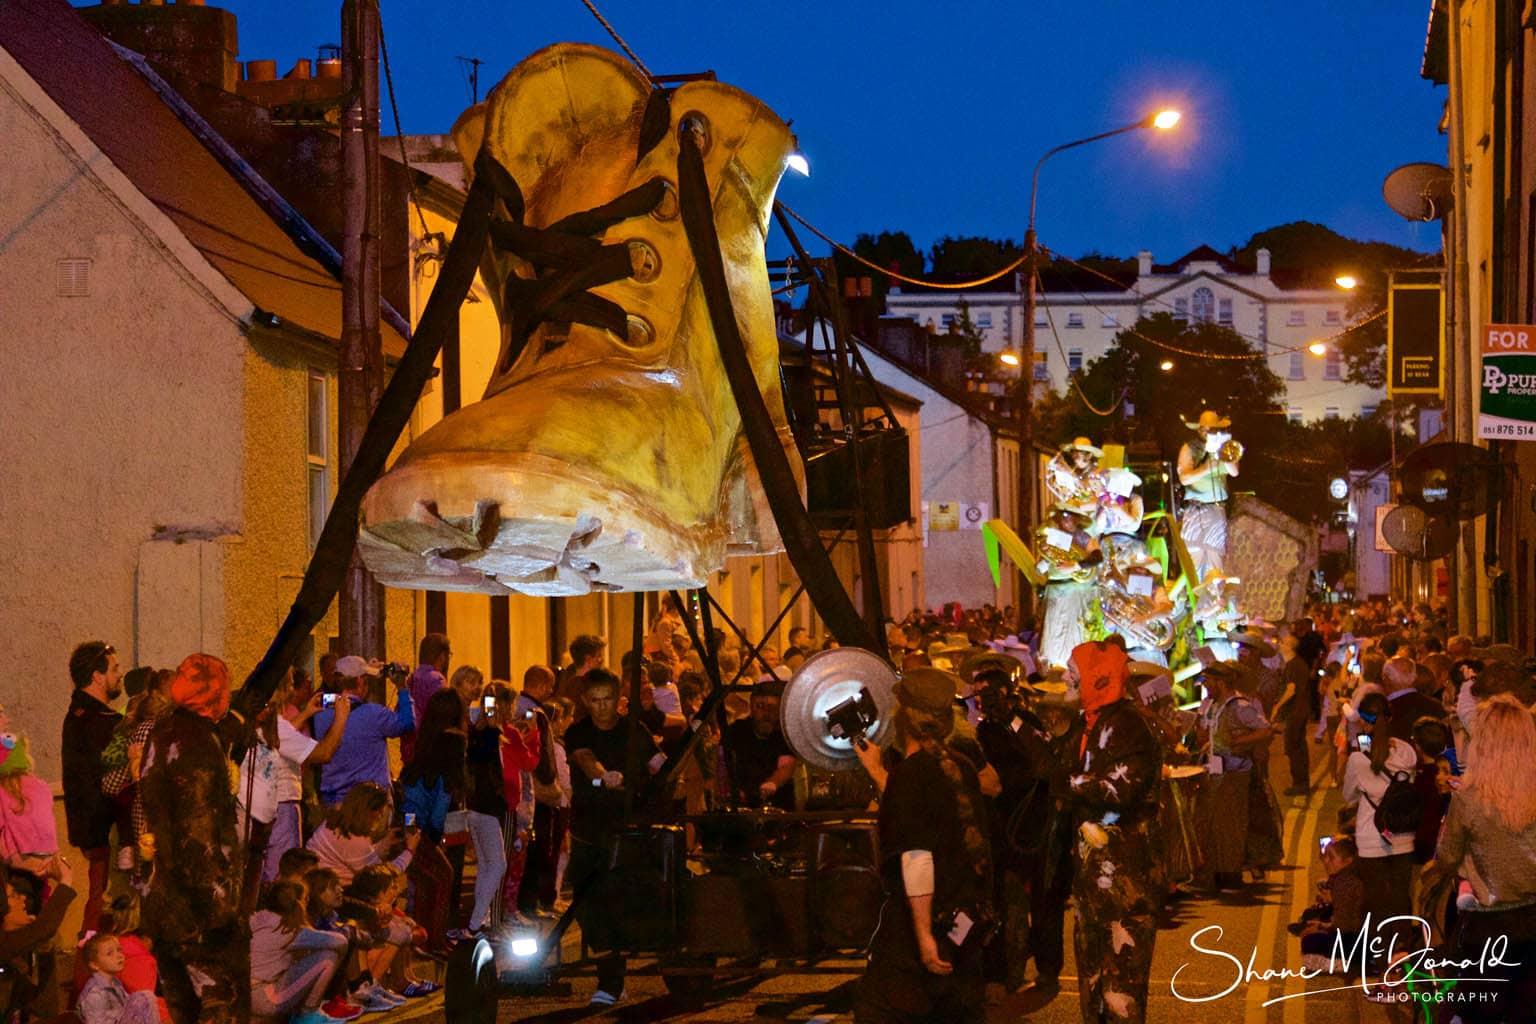 The Big Boot - Spraoi Parade 2018